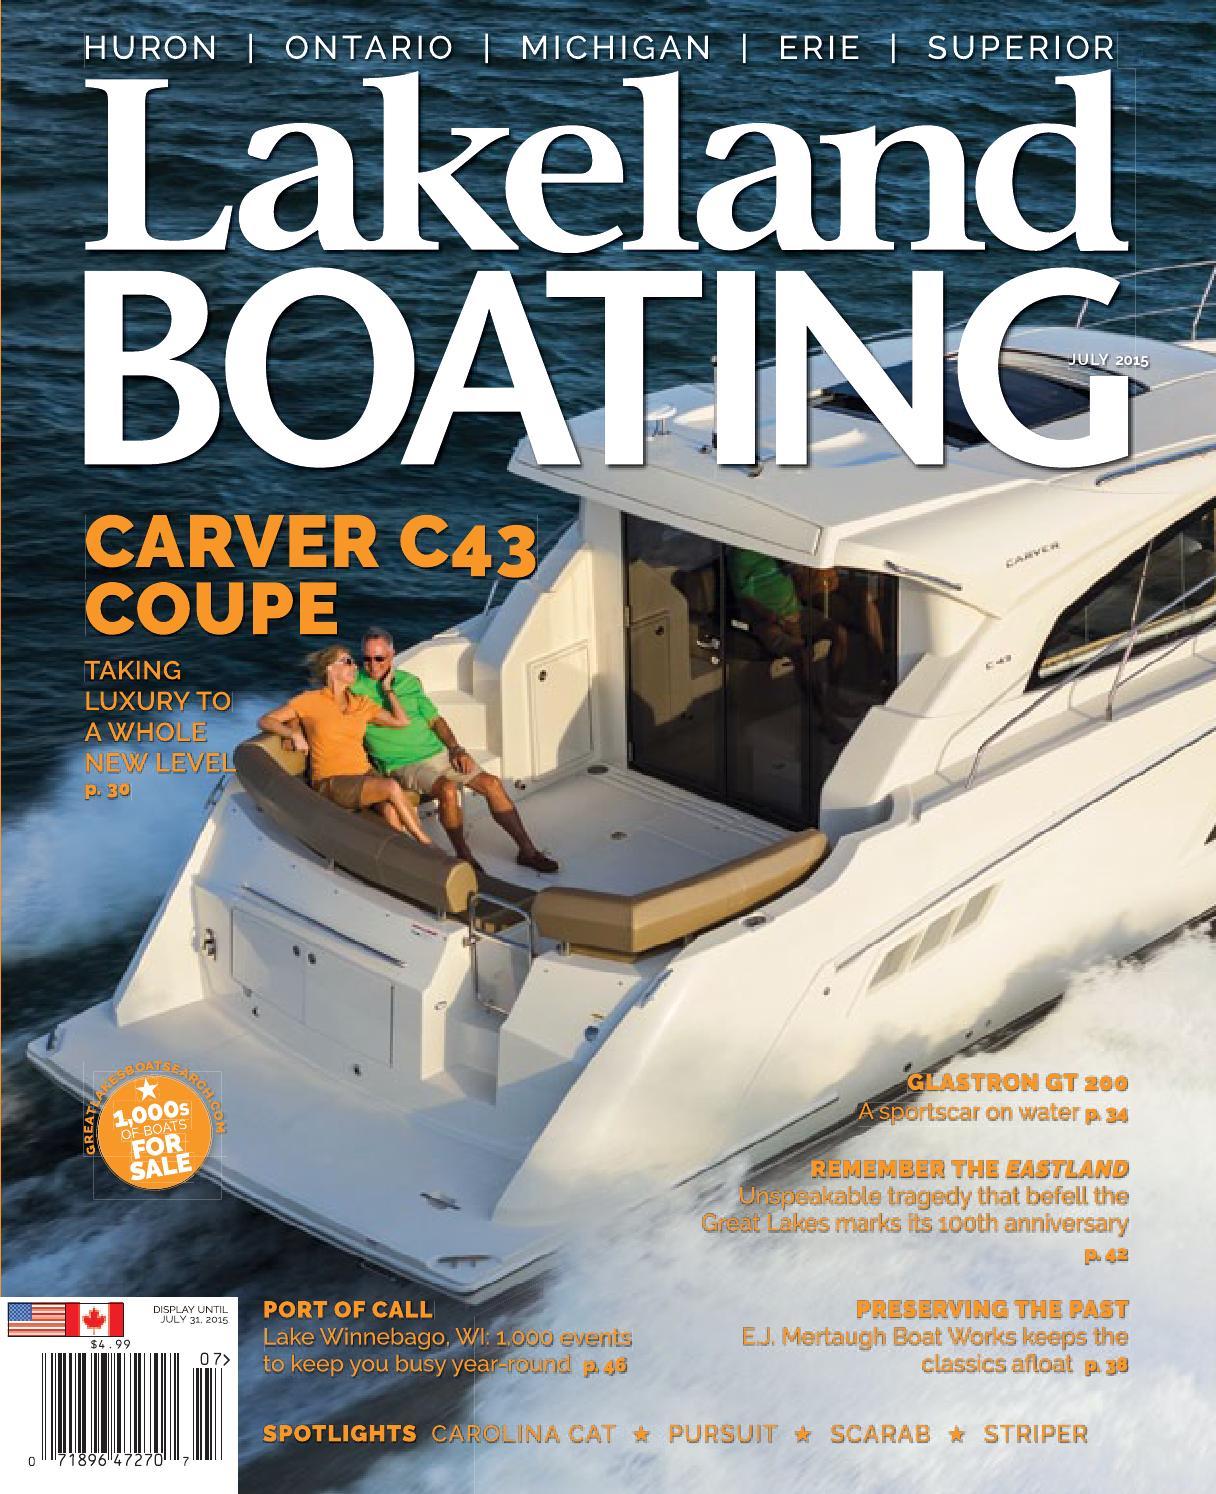 july 2015 by lakeland boating magazine issuu  rinker 270 fiesta vee manual meat.php #10